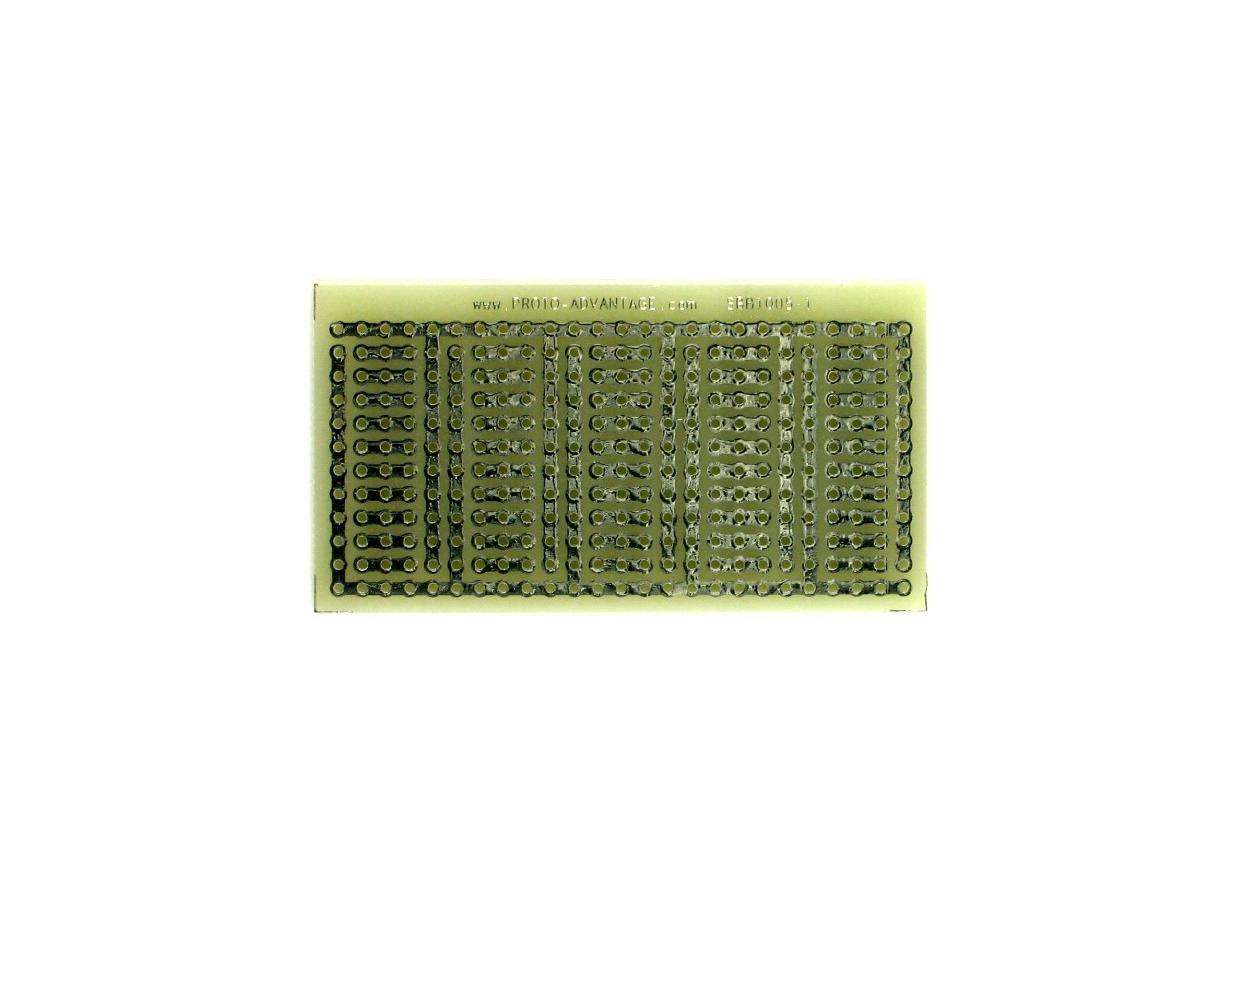 Solder Breadboard (10 row 5 column) 0